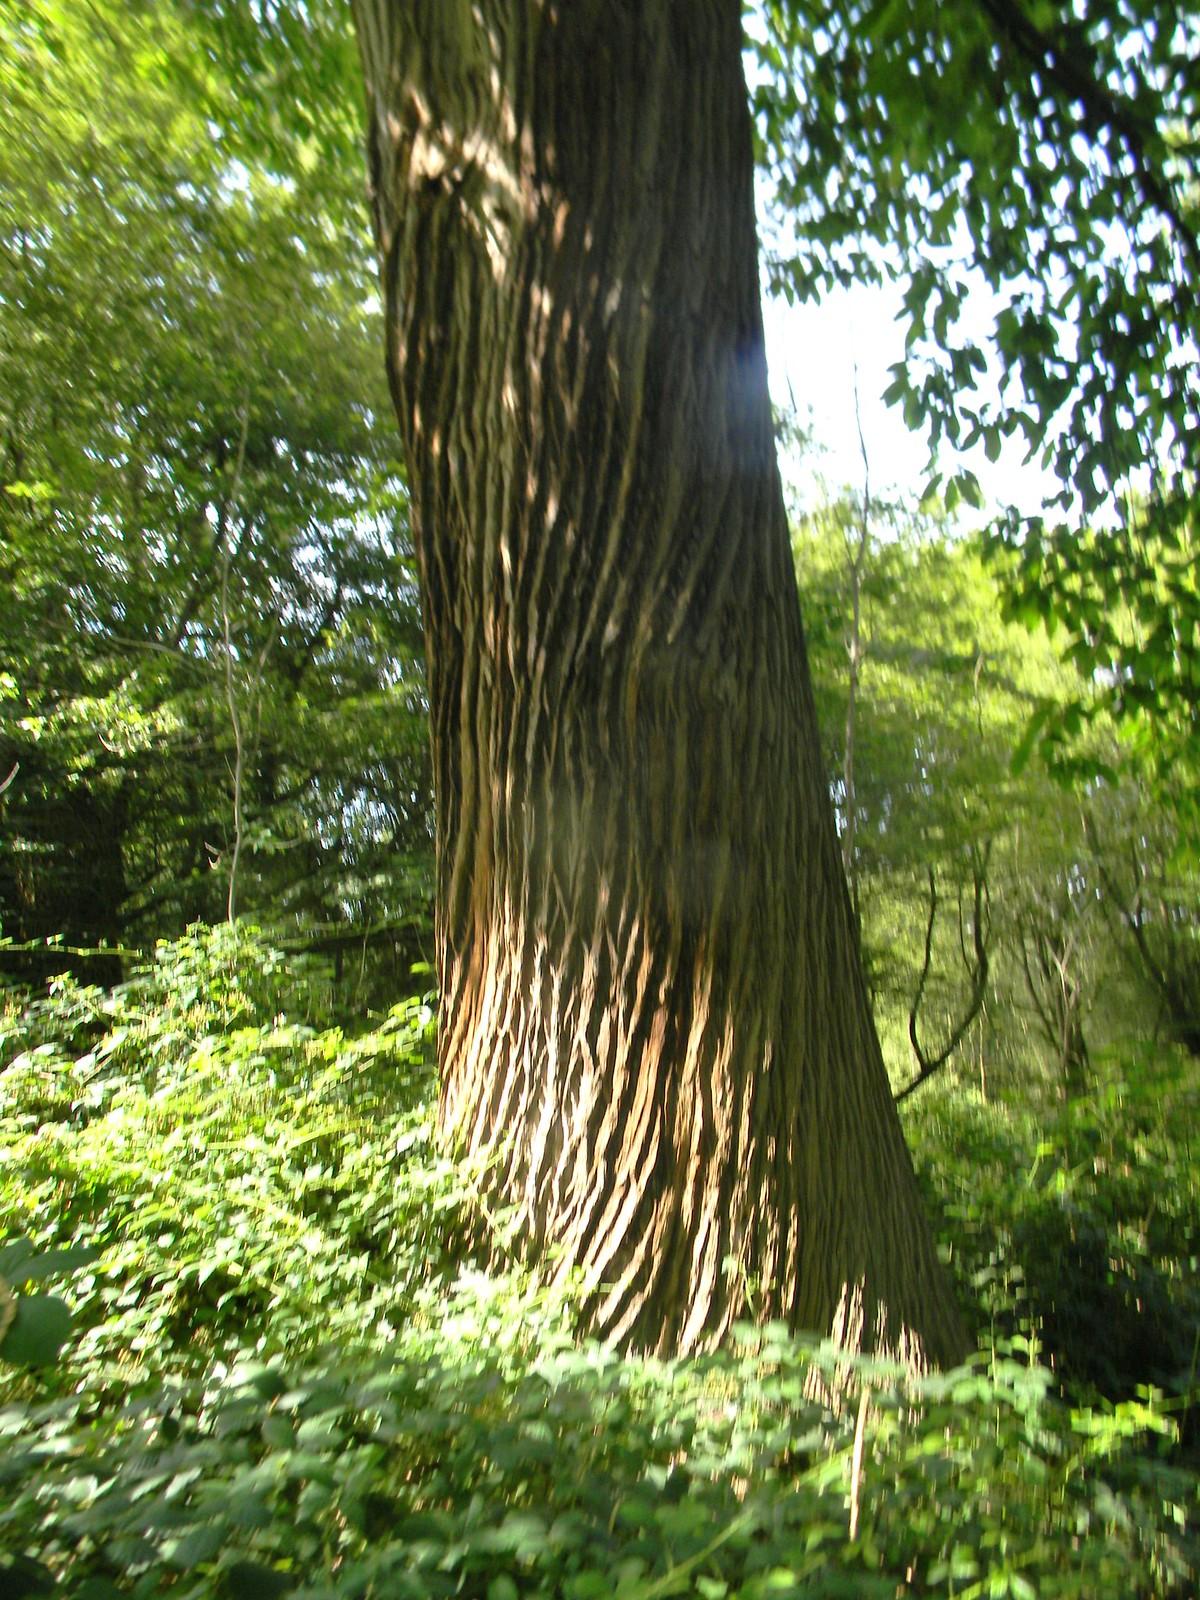 Old chestnut Shoreham figure of 8